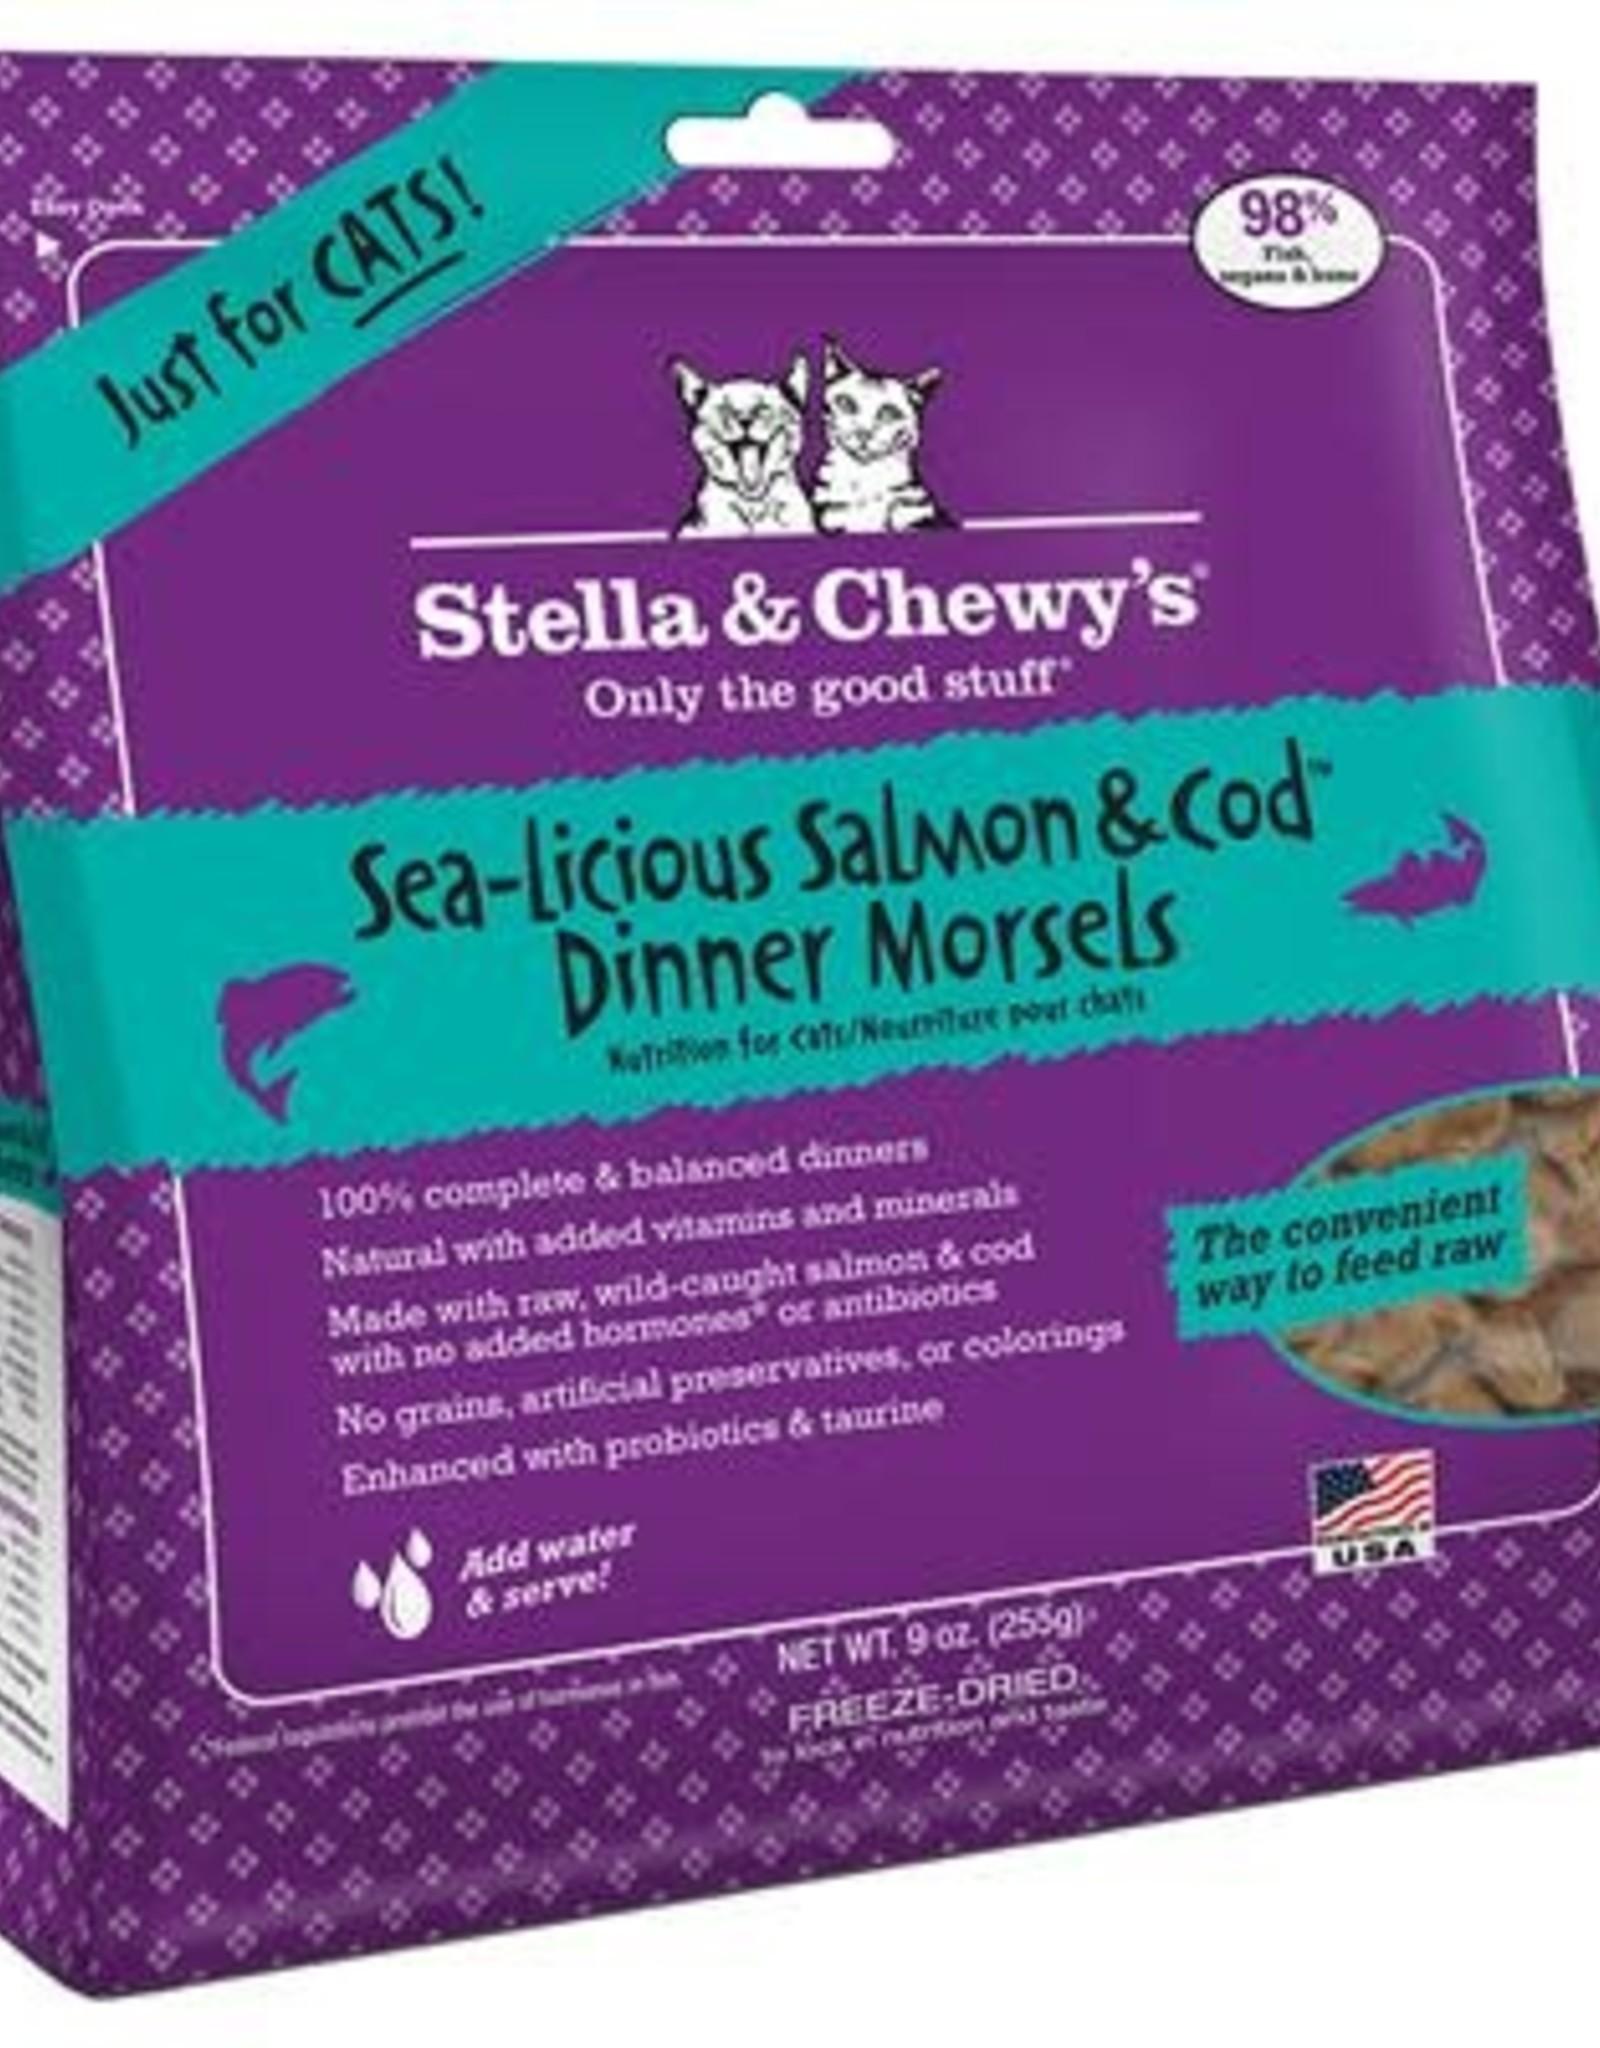 Stella & chewy's Stella & Chewy's FD Dinner Morsels Salmon & Cod 8OZ Cat